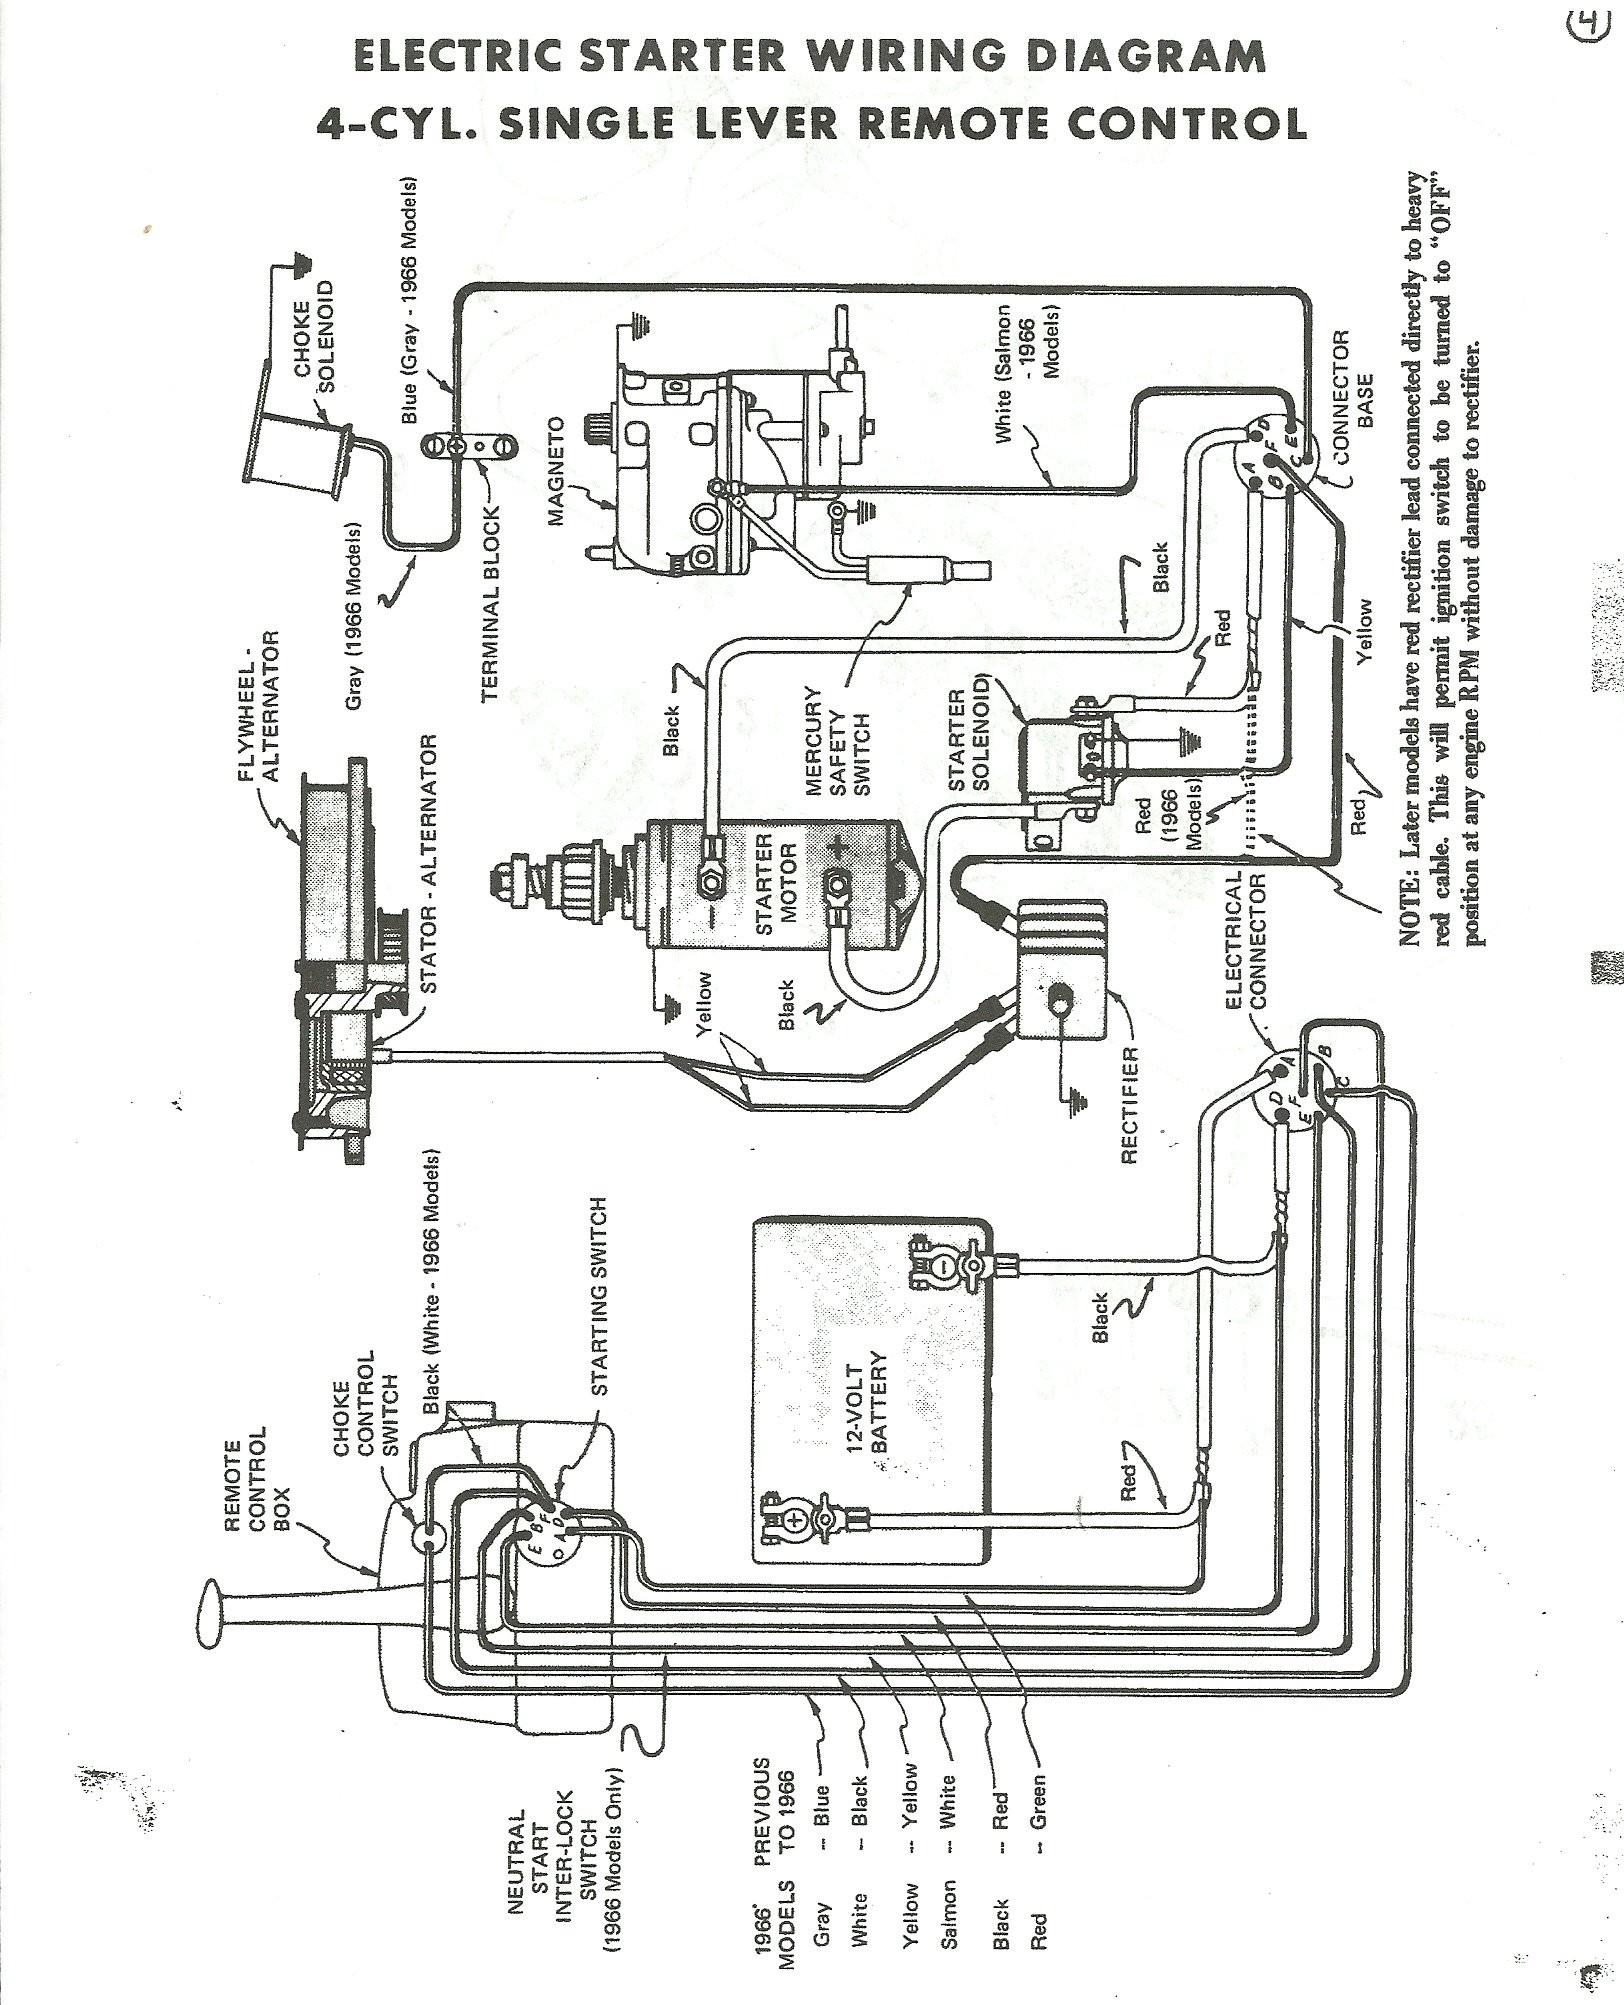 Mercury 4 Stroke Key Switch Wiring I Have A 1965 Mercury 500 50 Hp Electric Start Using Boat Of Mercury 4 Stroke Key Switch Wiring